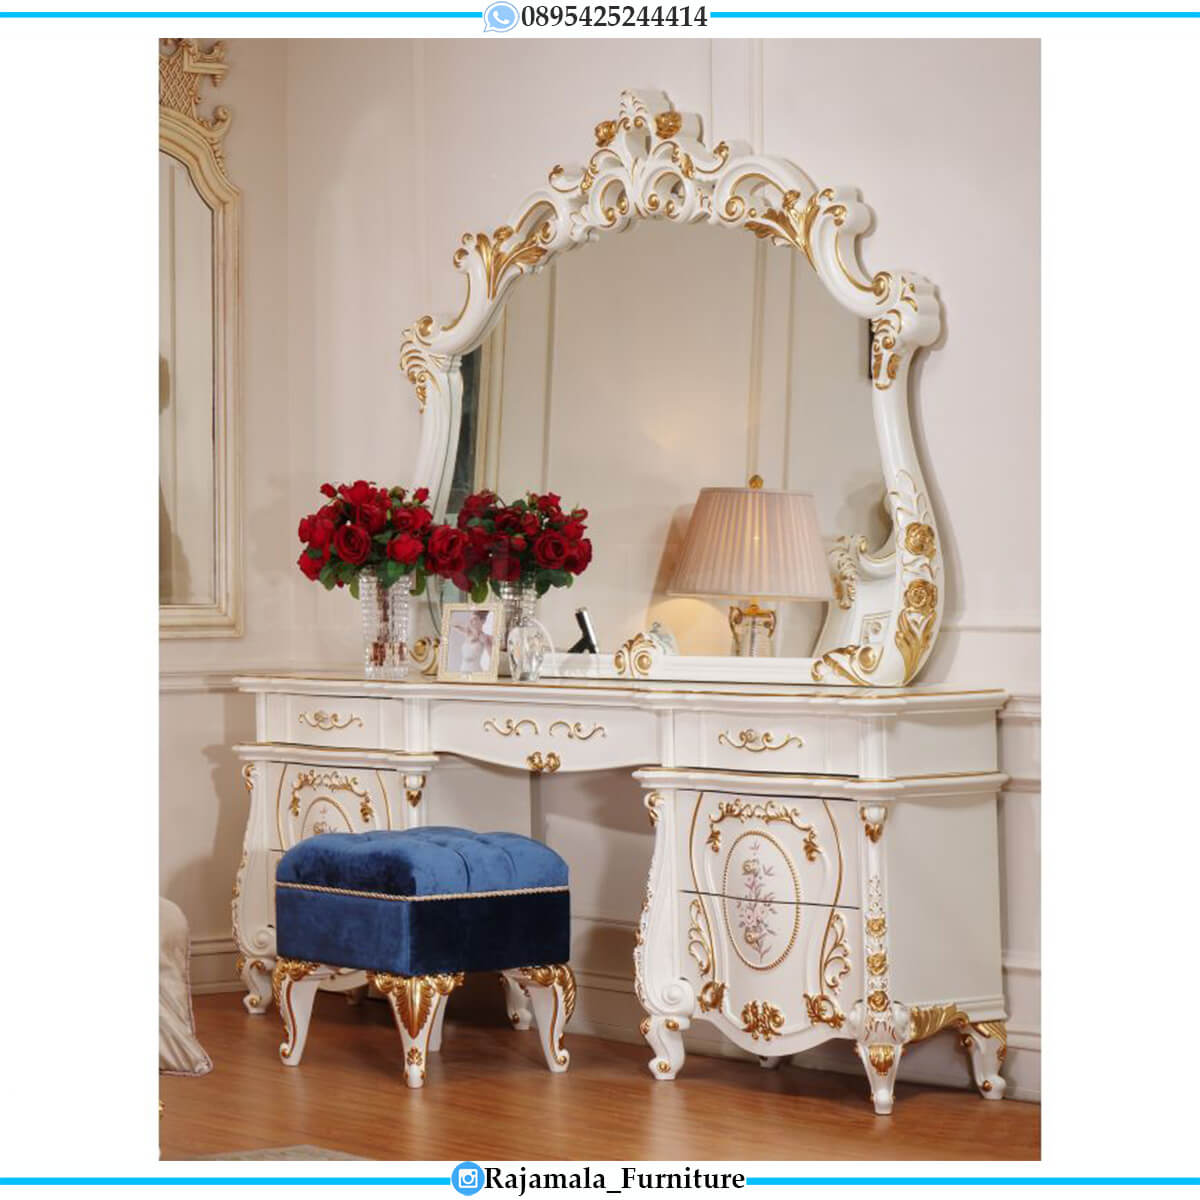 New Set Meja Rias Mewah Ukiran Jepara Classic Luxury Style RM-0585